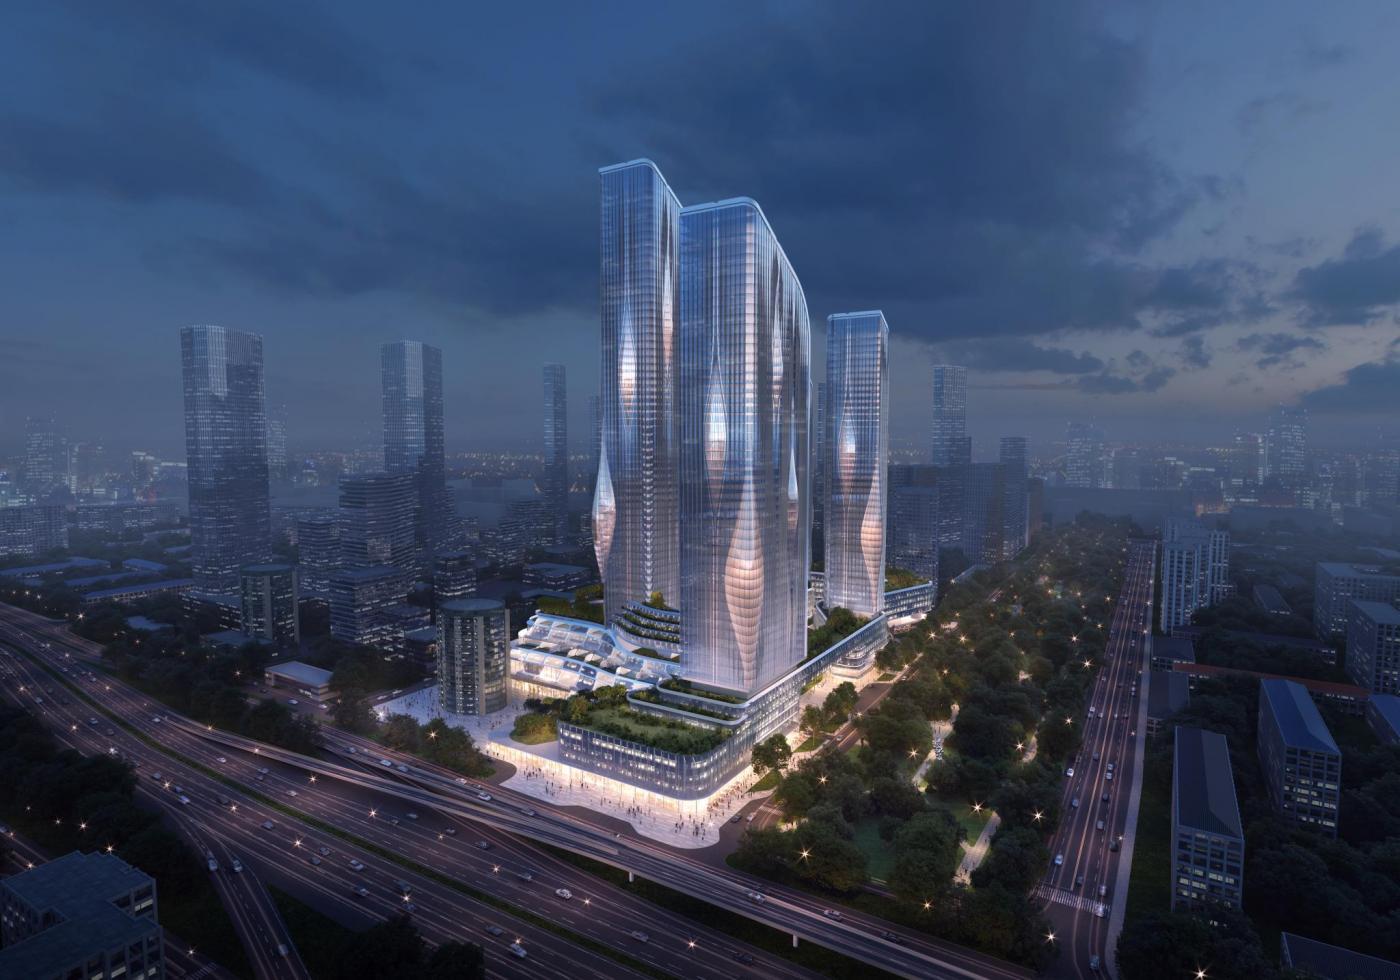 Жилой кластер по проекту Zaha Hadid Architects появится на северо-западе Москвы